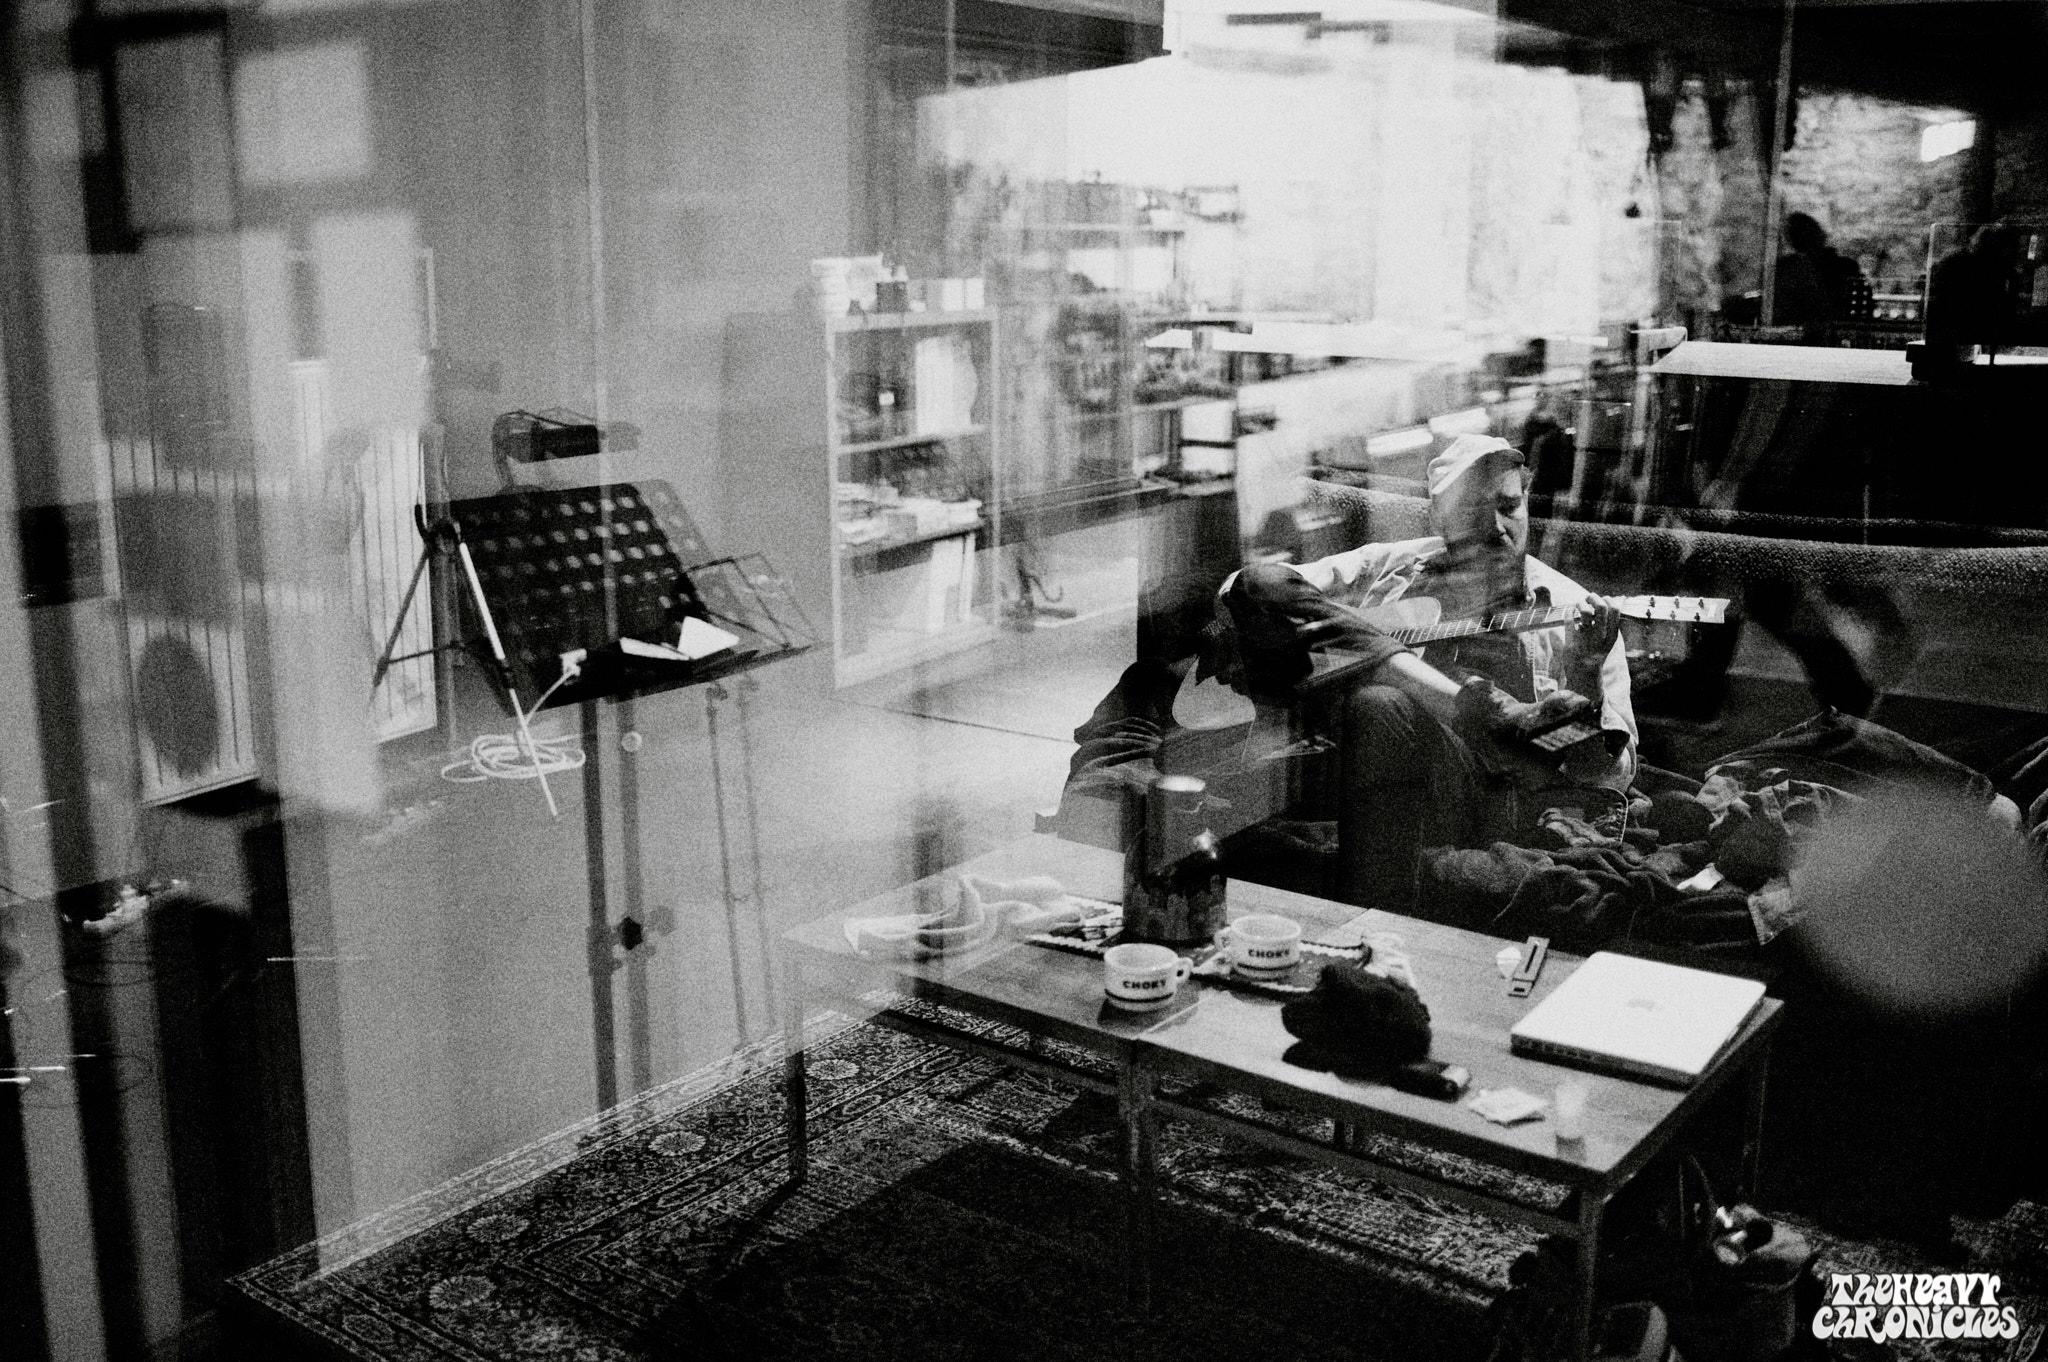 Elder-Studio-Black-Box-2019-Gael-Mathieu-The-Heavy-Chronicles-88